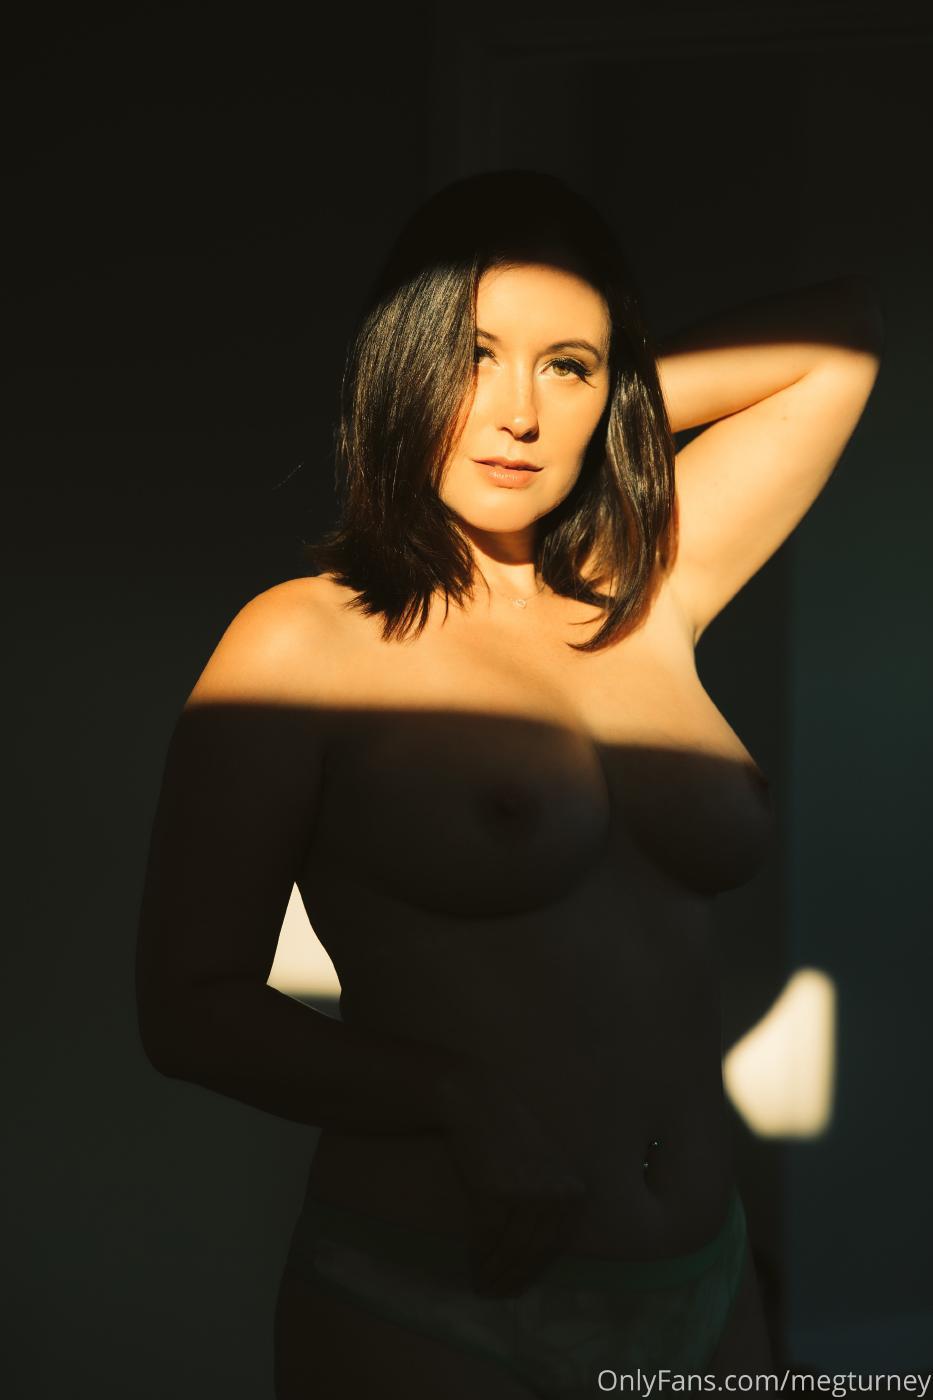 Meg Turney Nude Sunset Onlyfans Set Leaked Zgeaxa